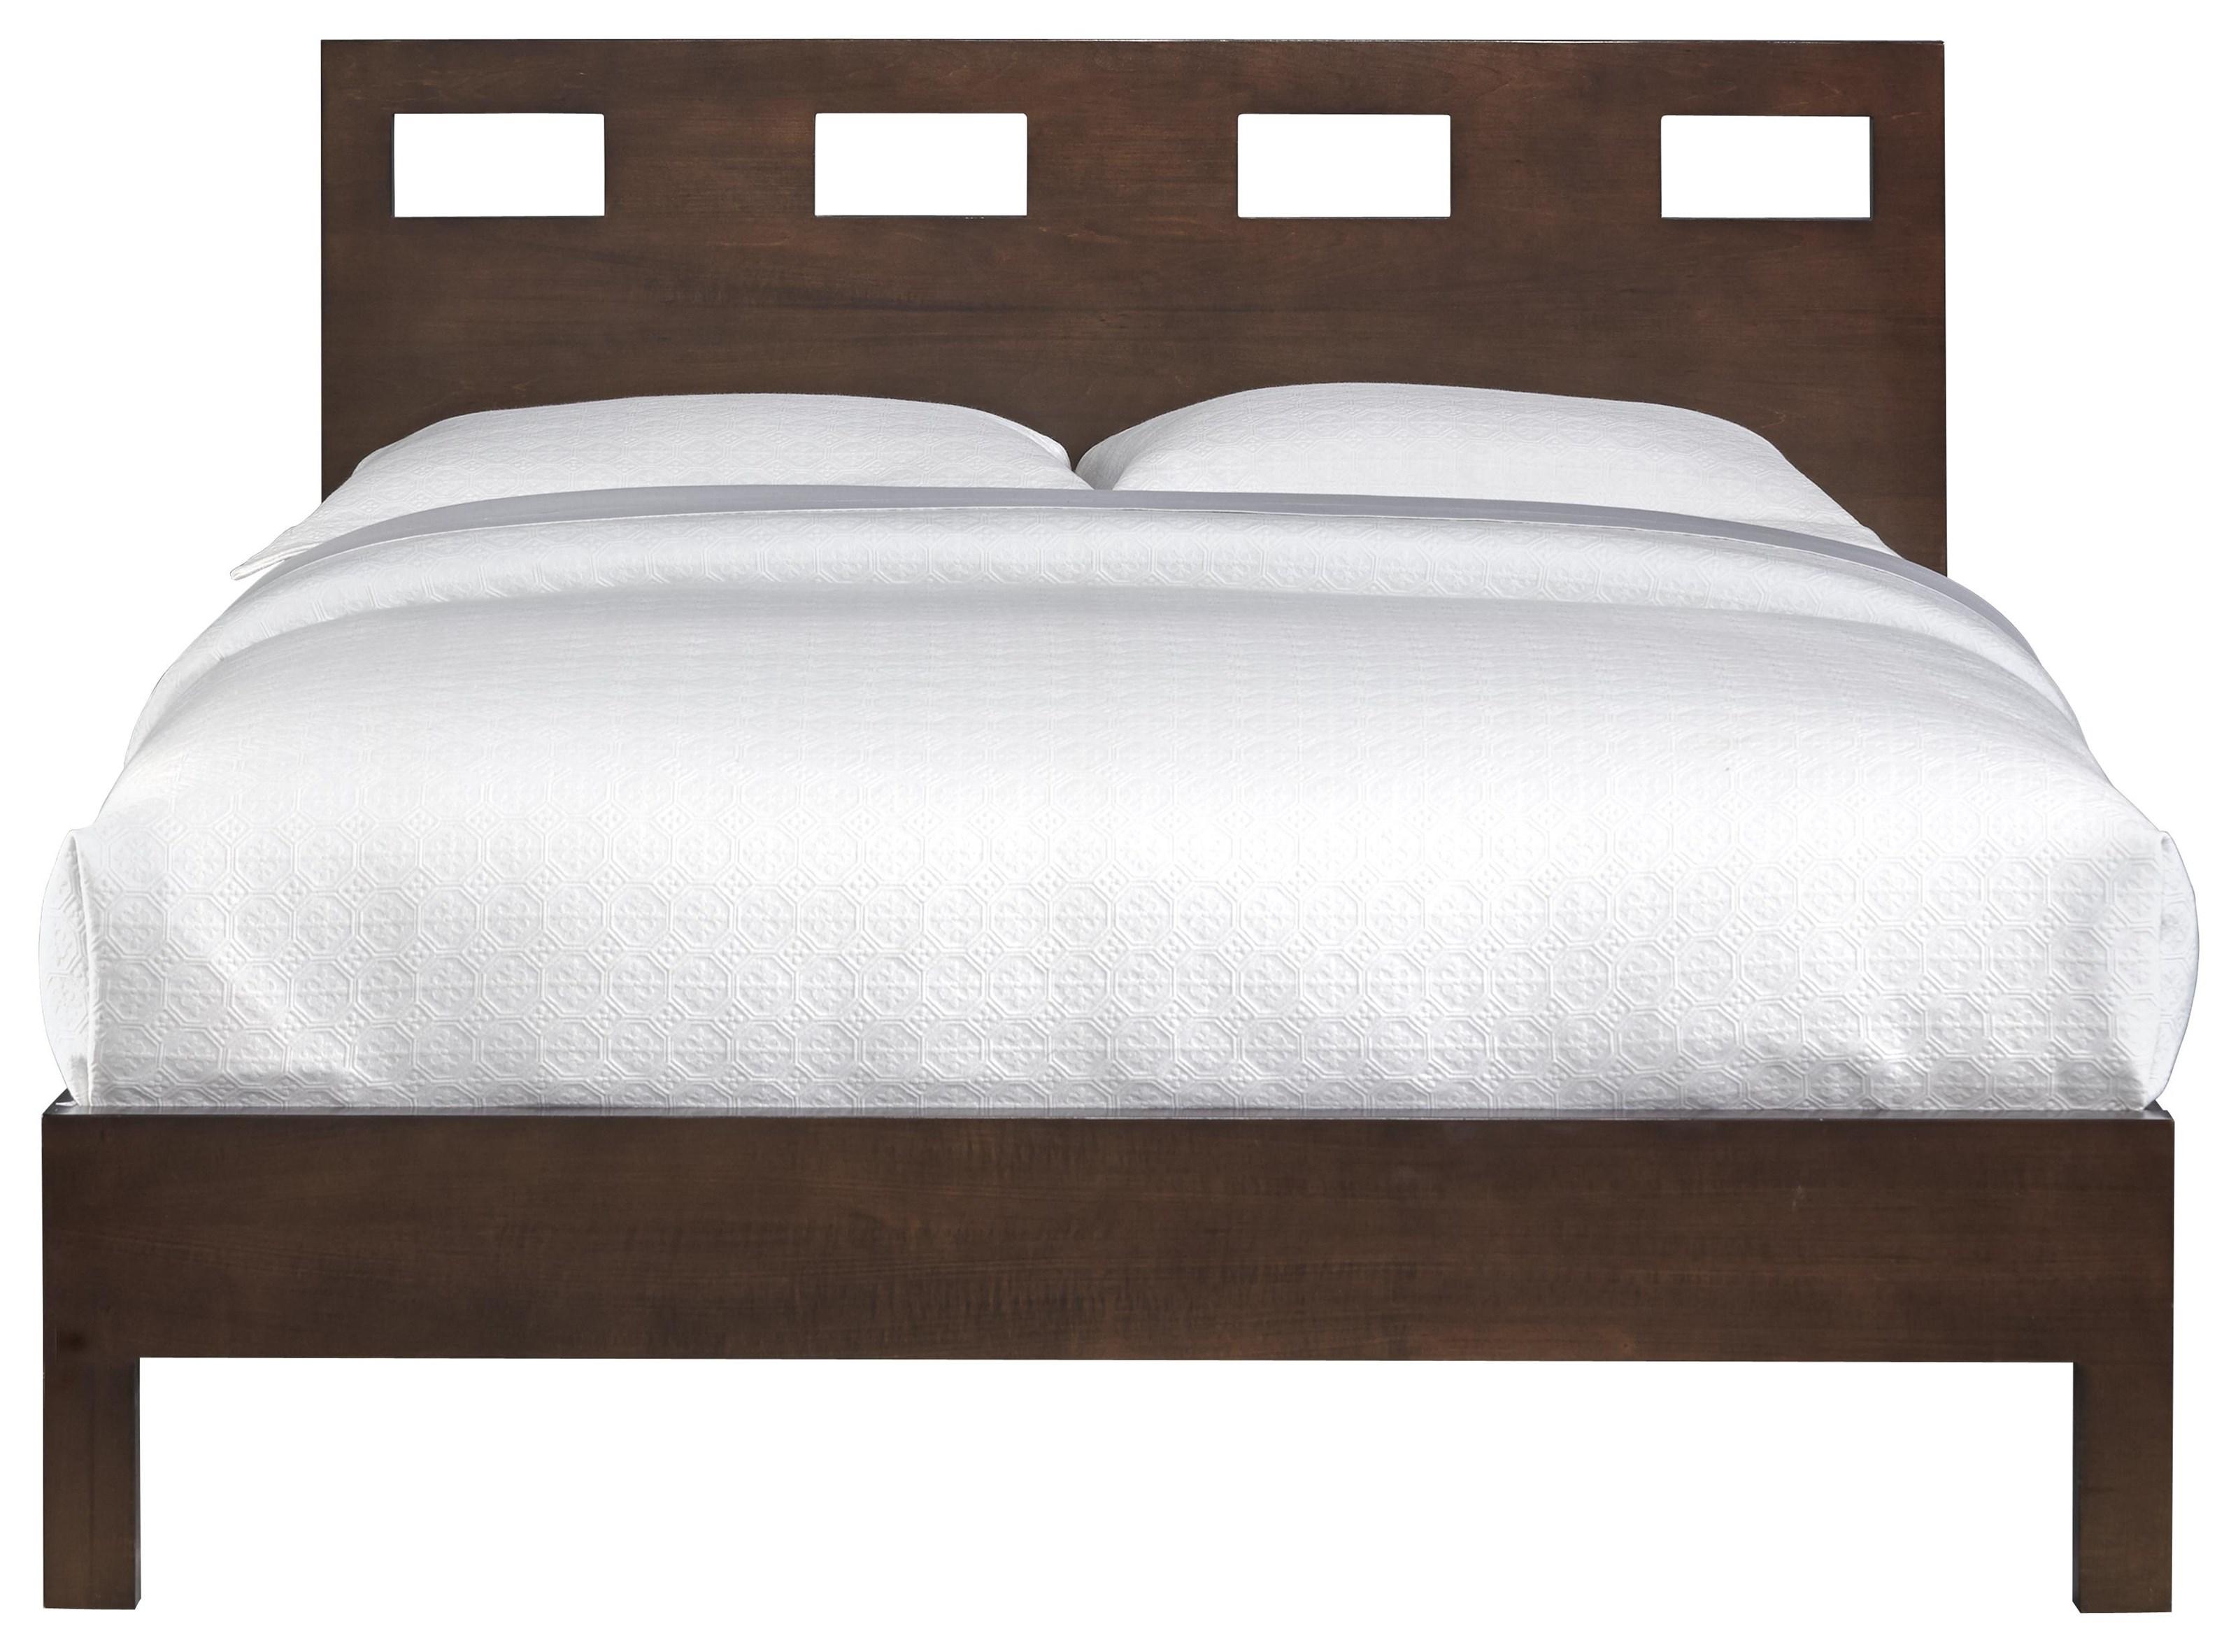 Modus International Riva California King Bed - Item Number: Rv 26 F6 Riva